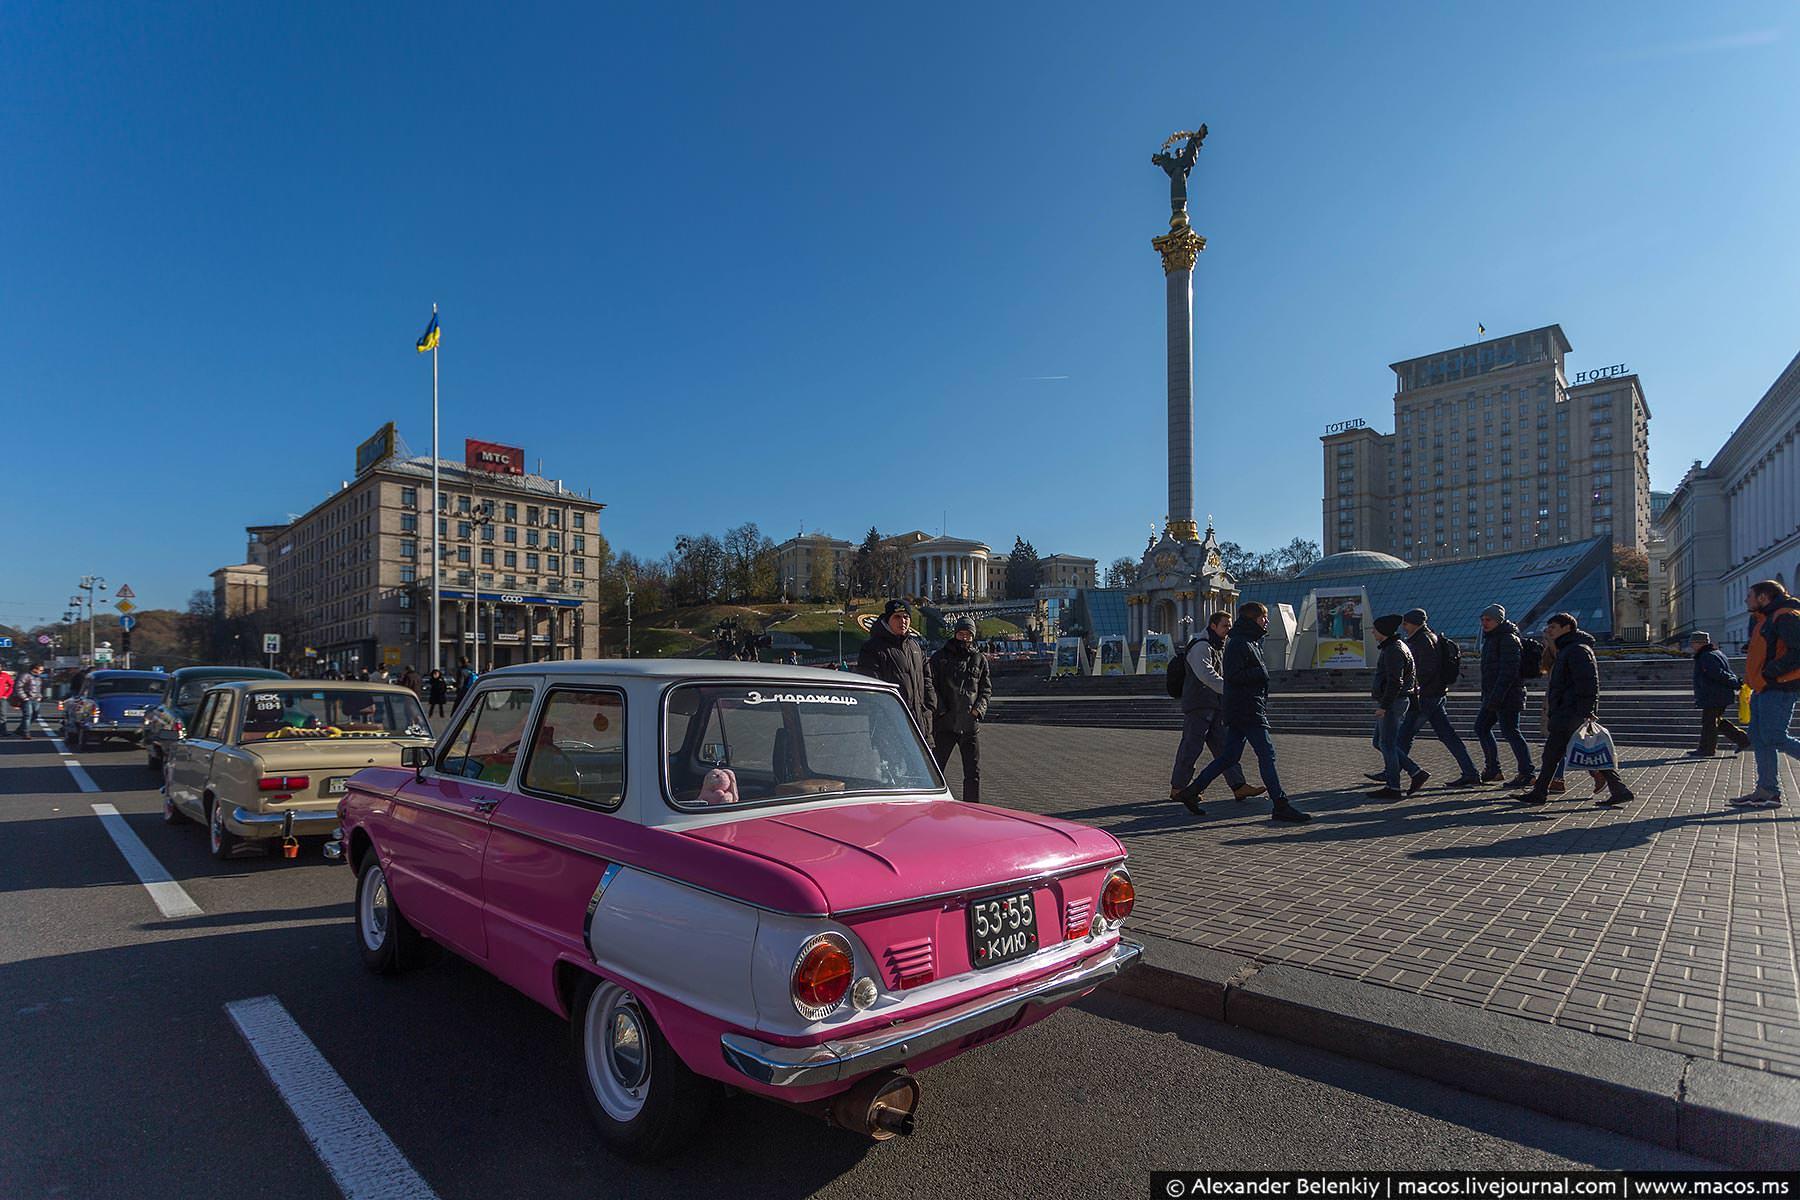 Киевский Майдан. Колыбель двух революций